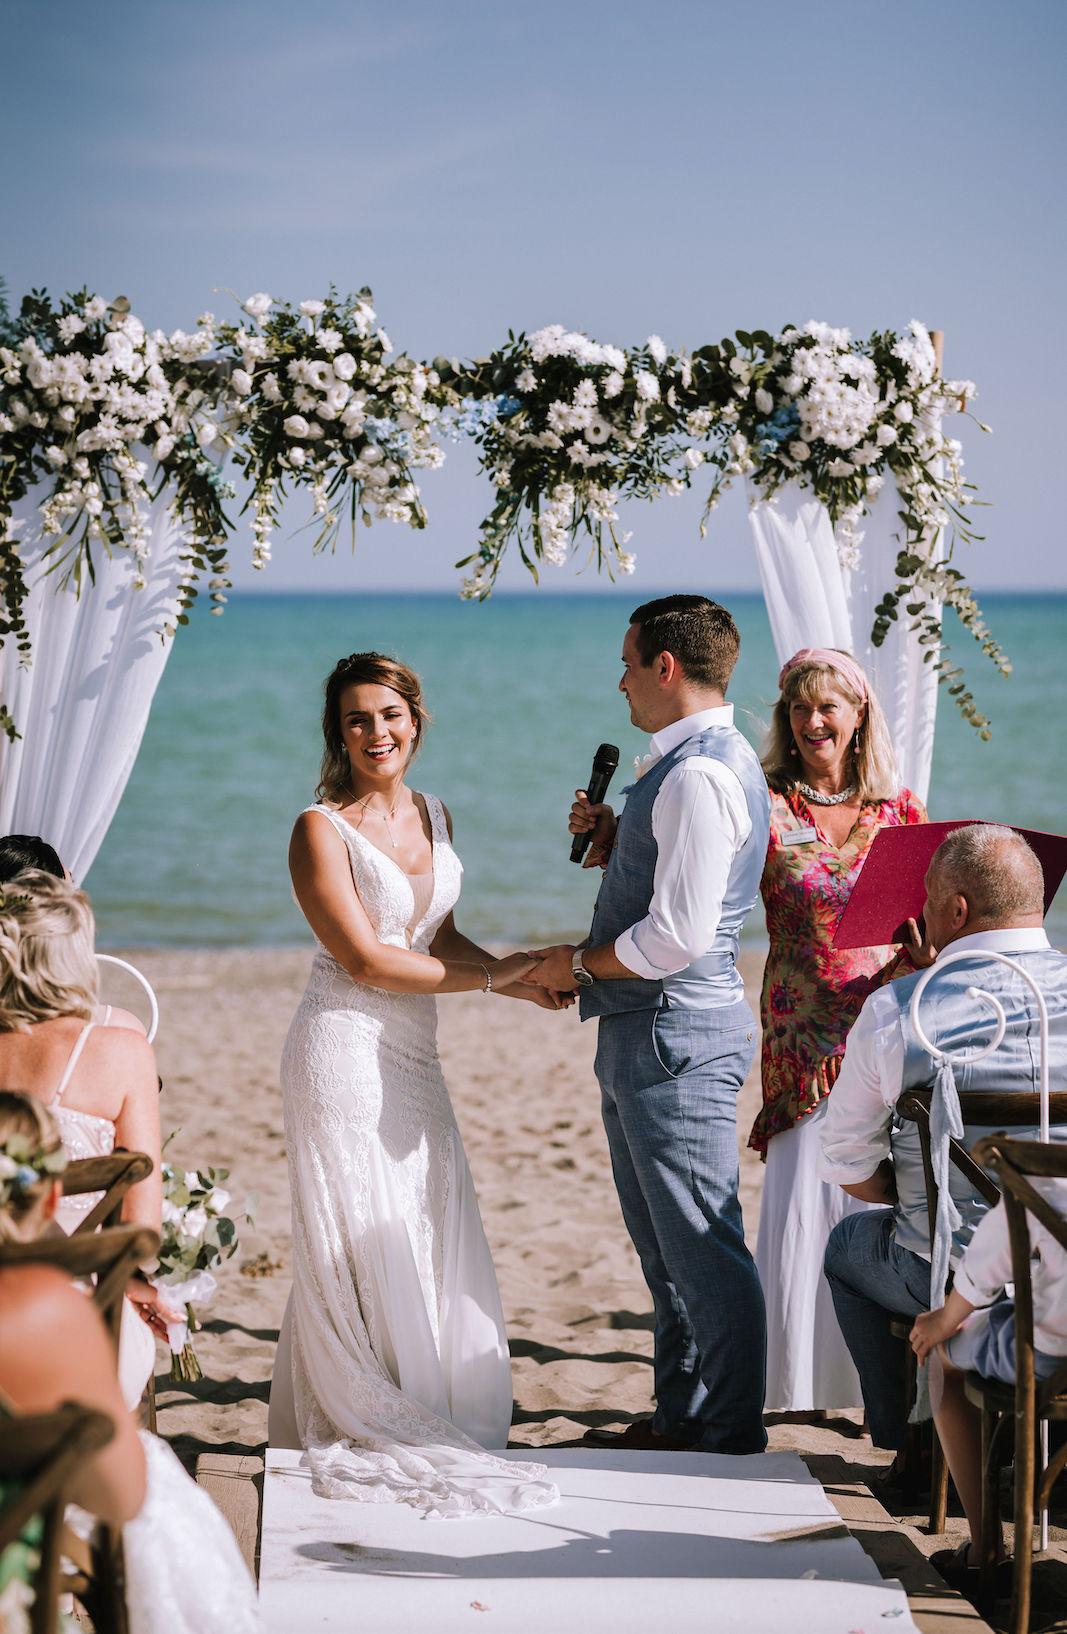 beach wedding bower Malaga officiant is Celebrant Spain and photographer Natasha Ince